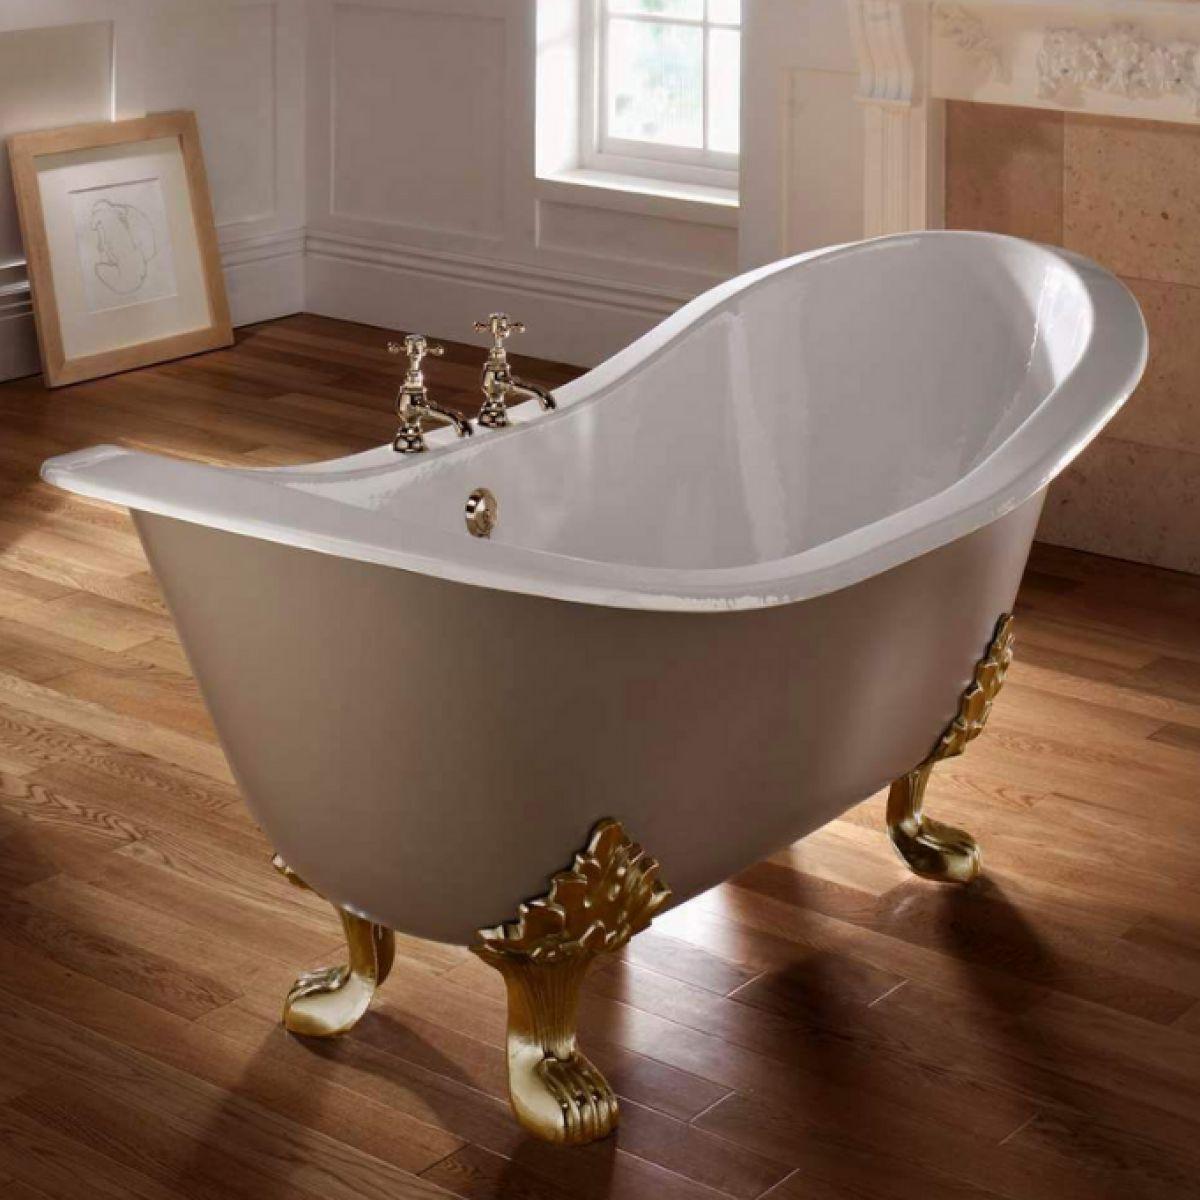 Slipper Bath Uk Imperial sheraton double ended slipper bath uk bathrooms imperial sheraton double ended slipper bath sisterspd